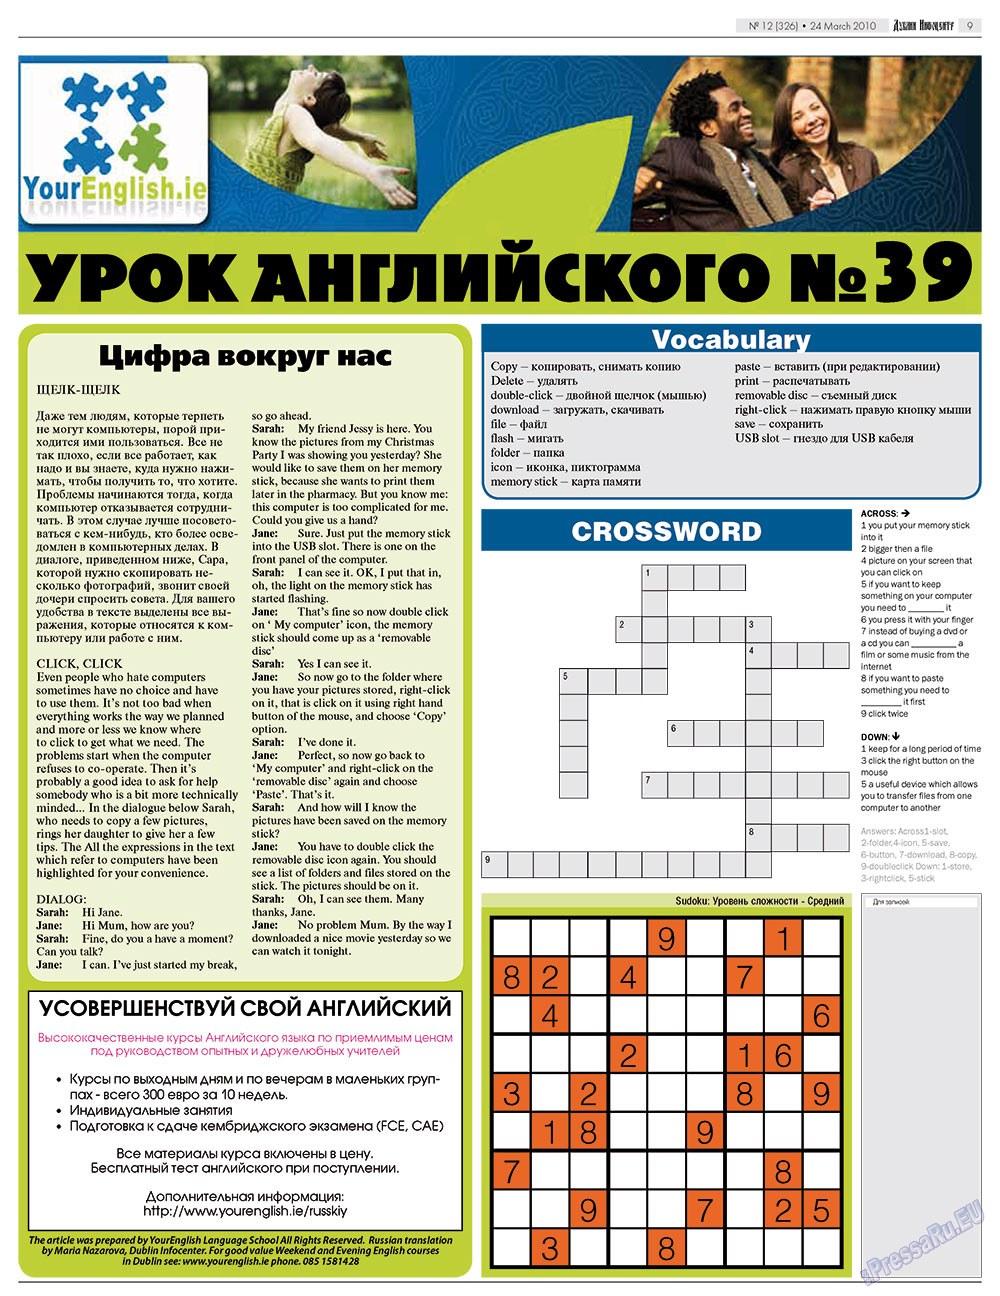 Дублин инфоцентр (газета). 2010 год, номер 12, стр. 9